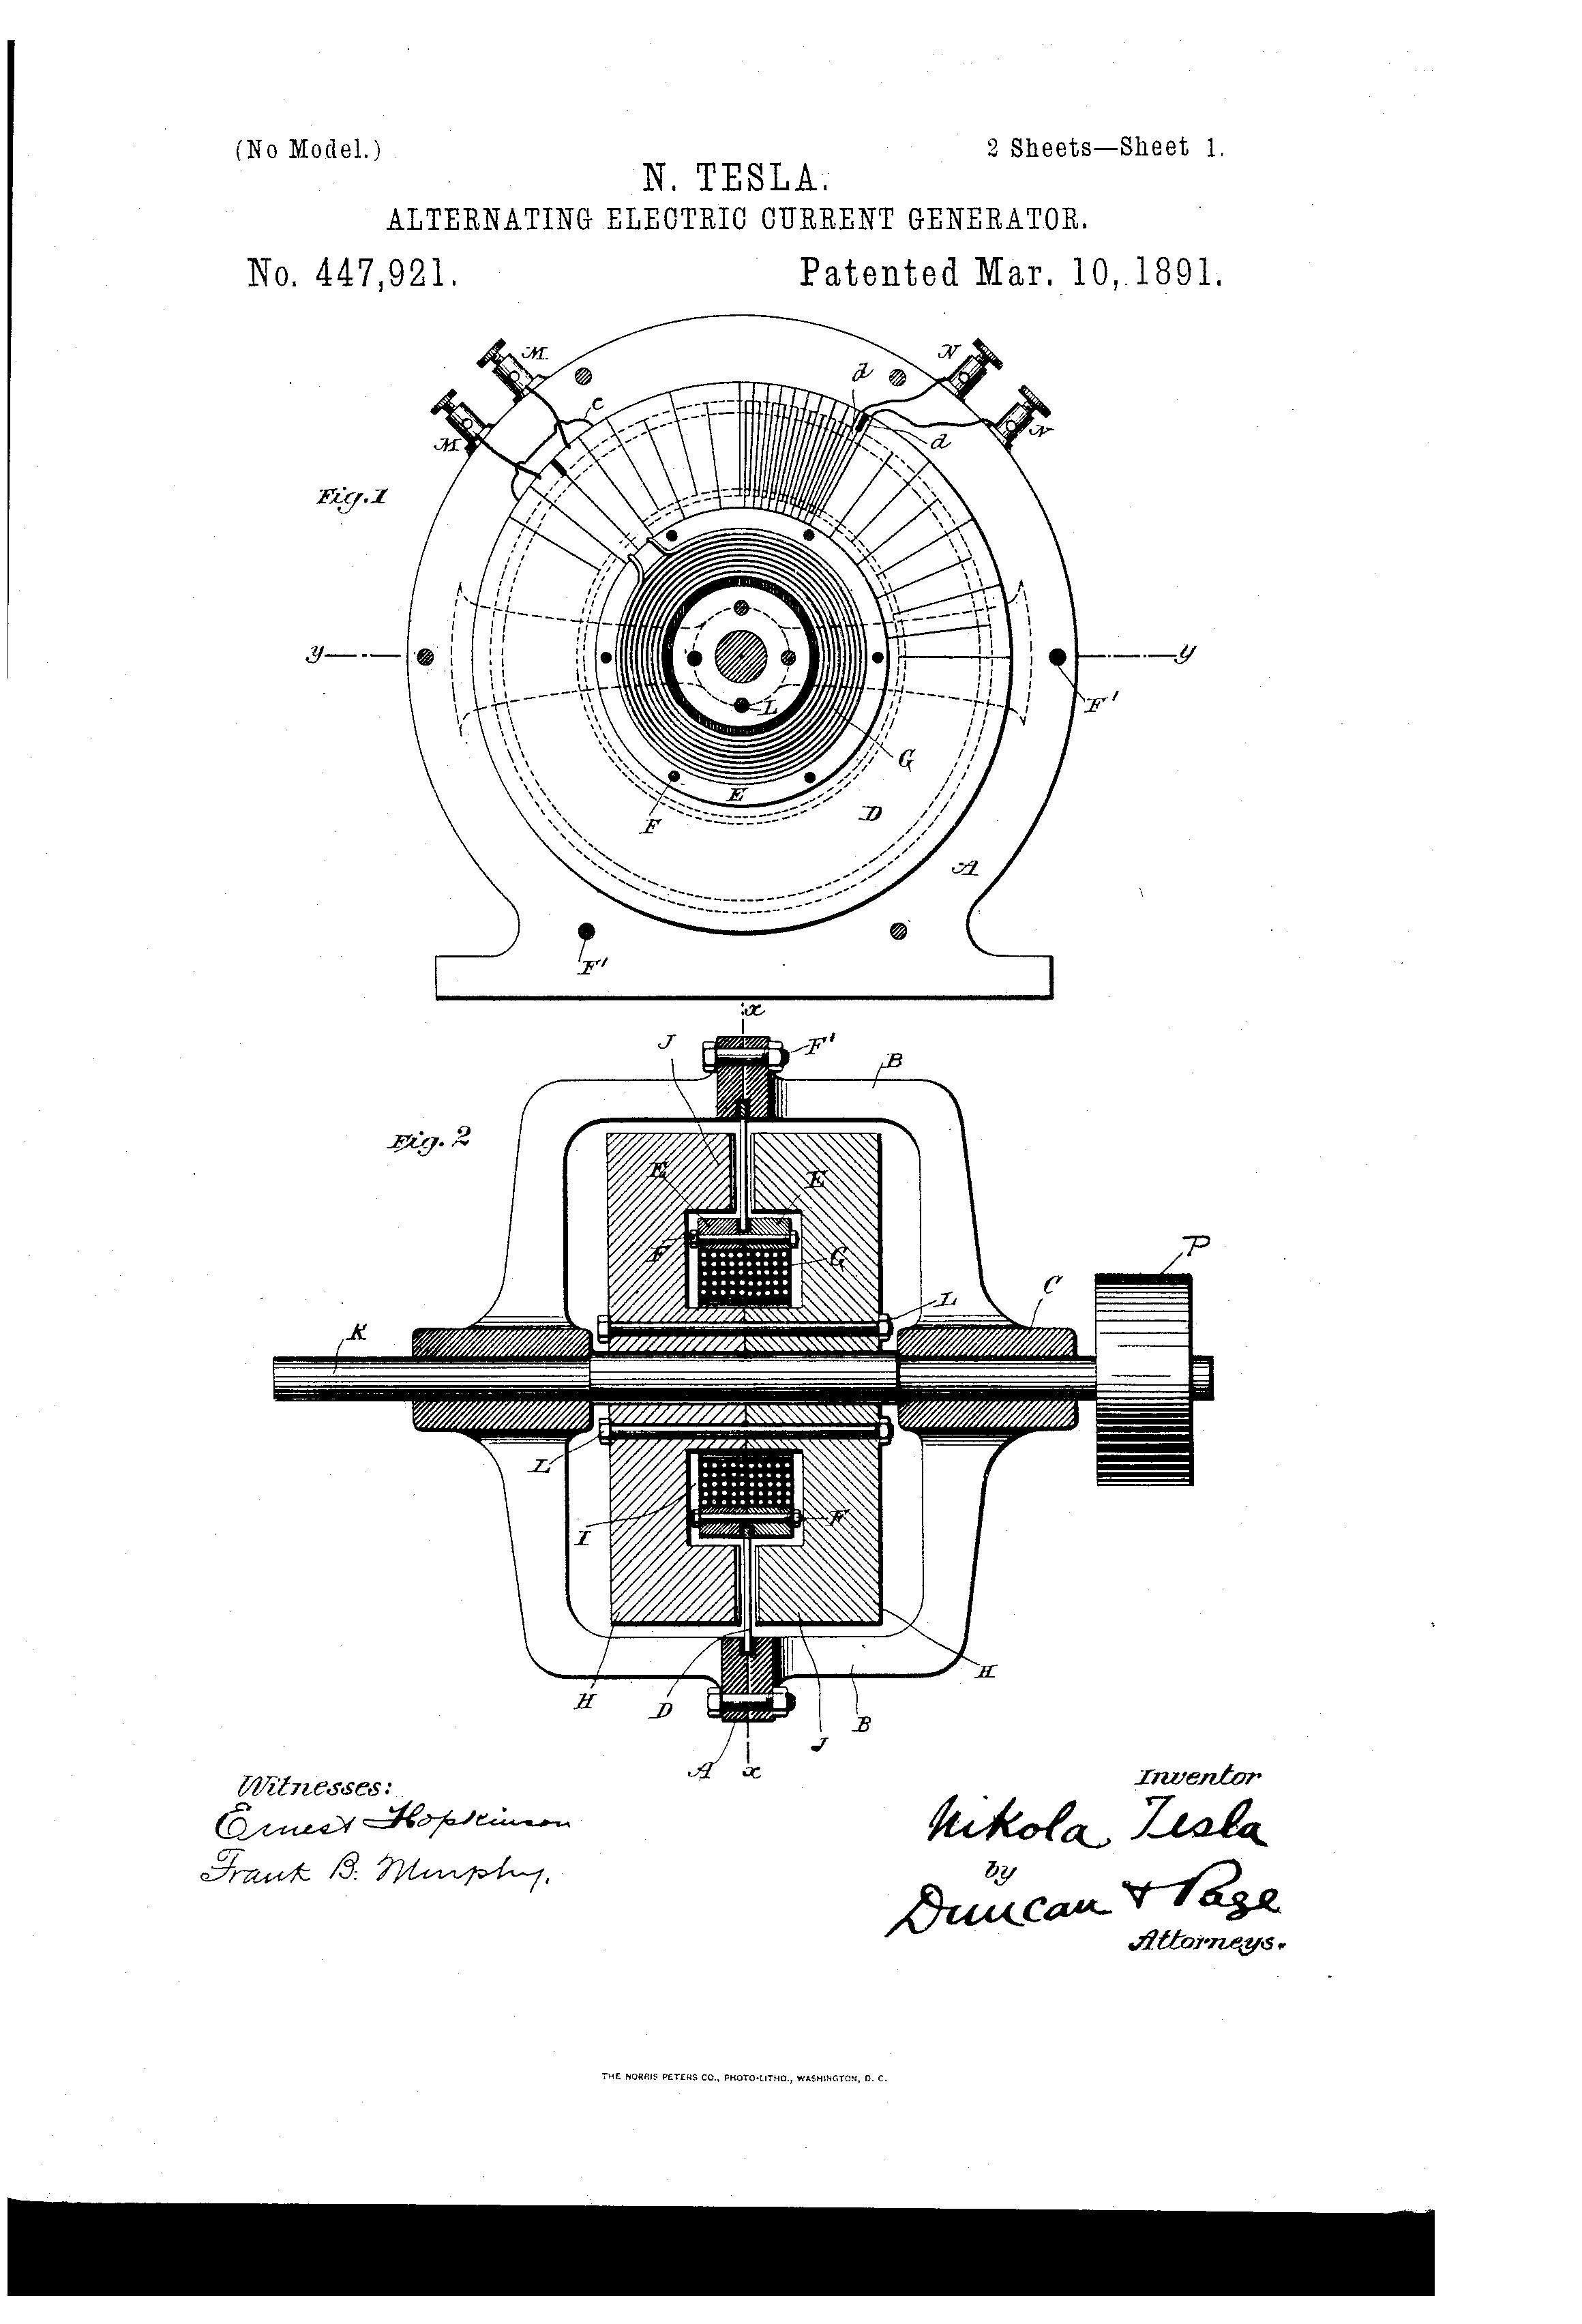 nikola tesla alternating current. patent drawing nikola tesla alternating current